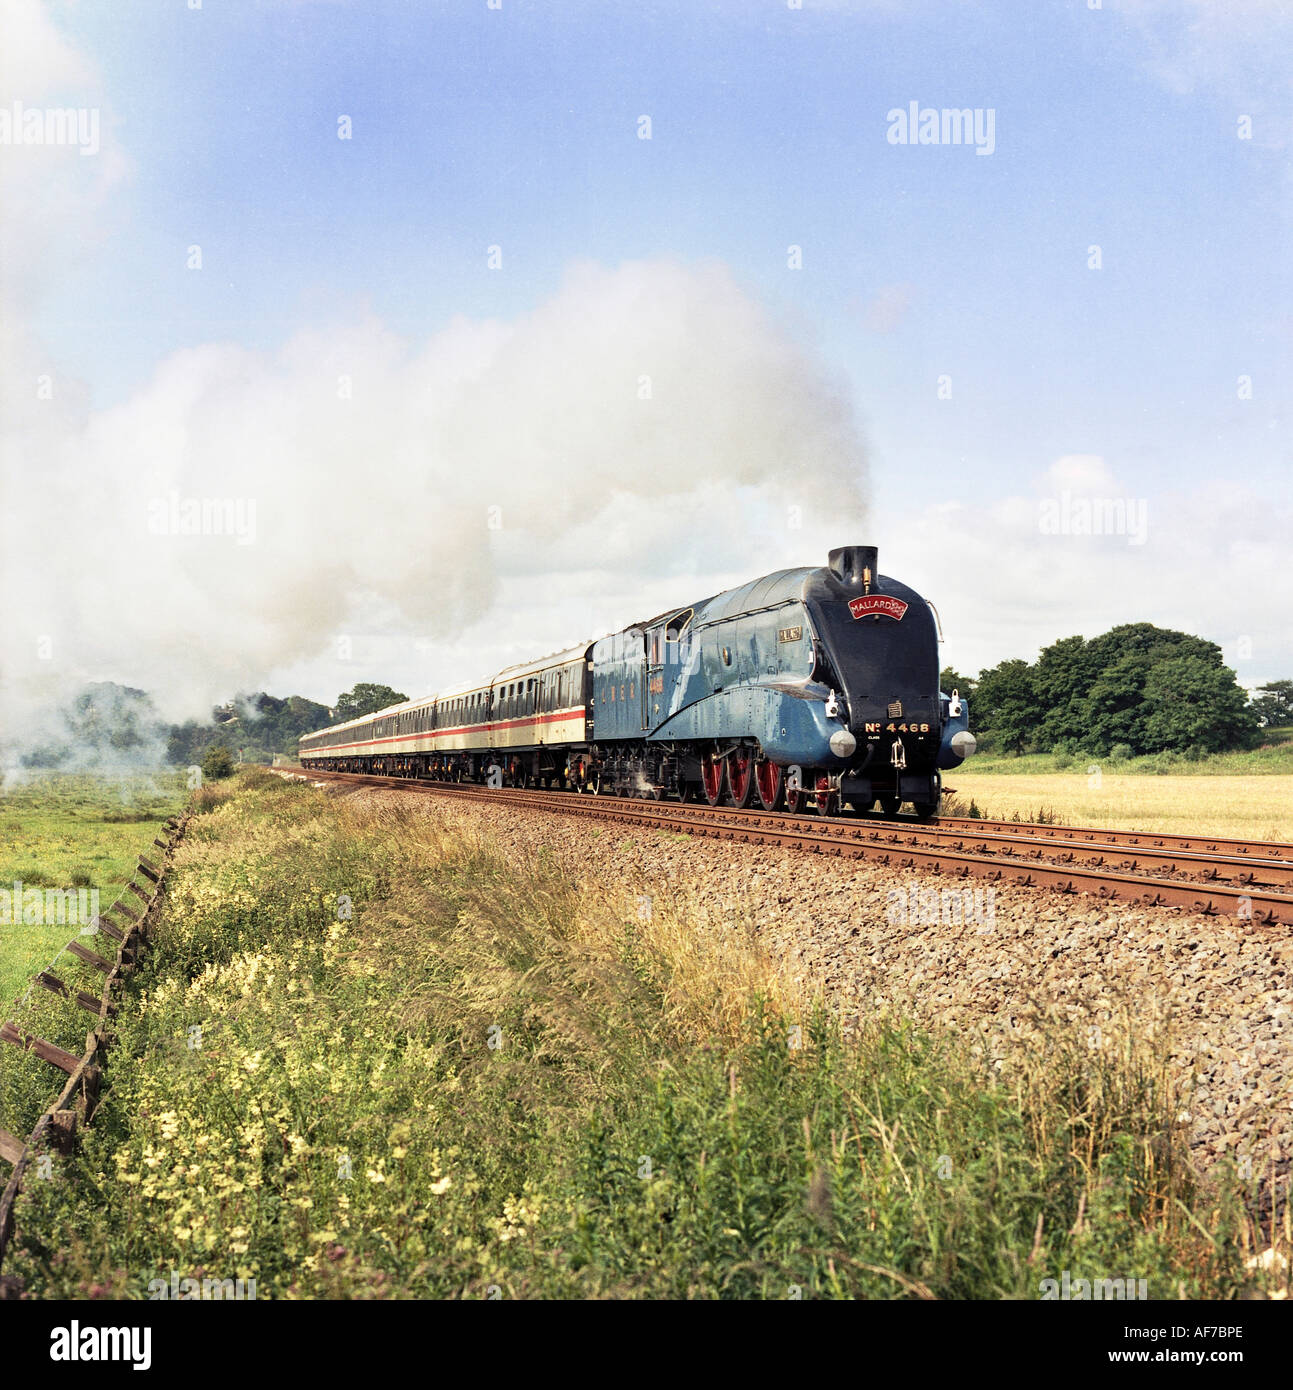 Steam railway train engine A4 Pacific No.4468 Mallard '88 World record holder fastest steam locomotive (achieved 3rd July 1938). - Stock Image